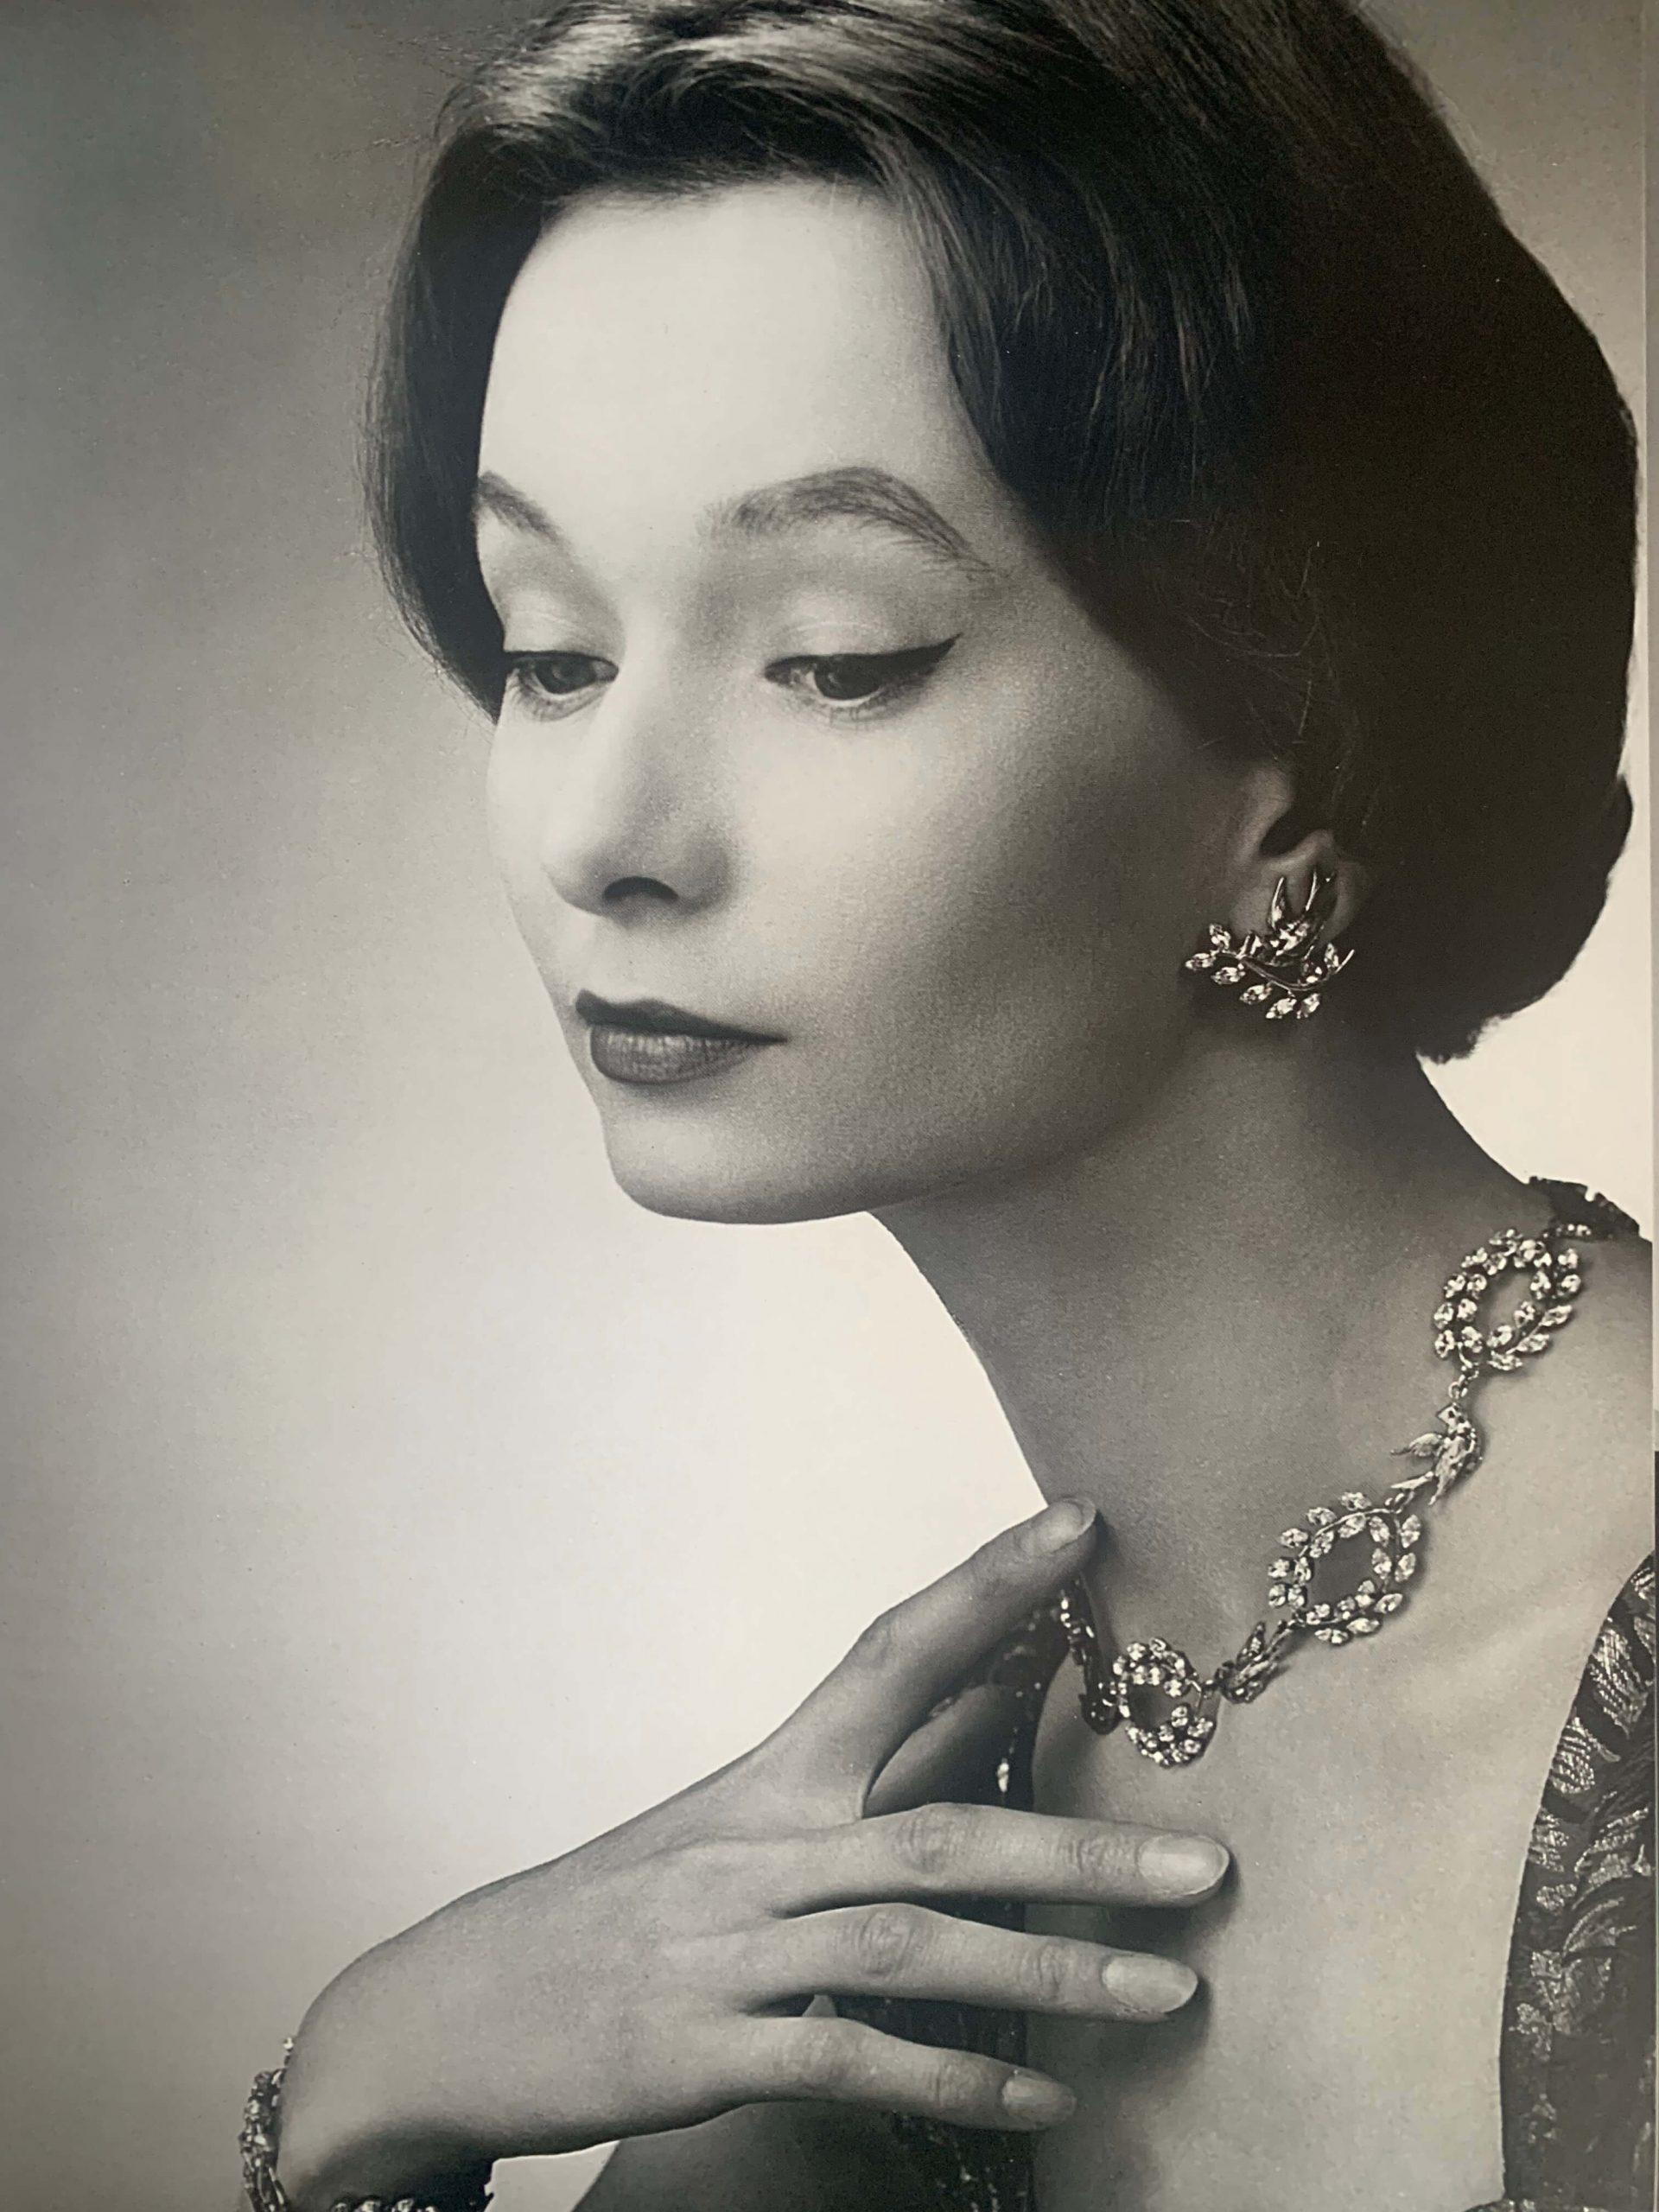 Christian Dior Bal Des Oiseaux Model Image 1950s